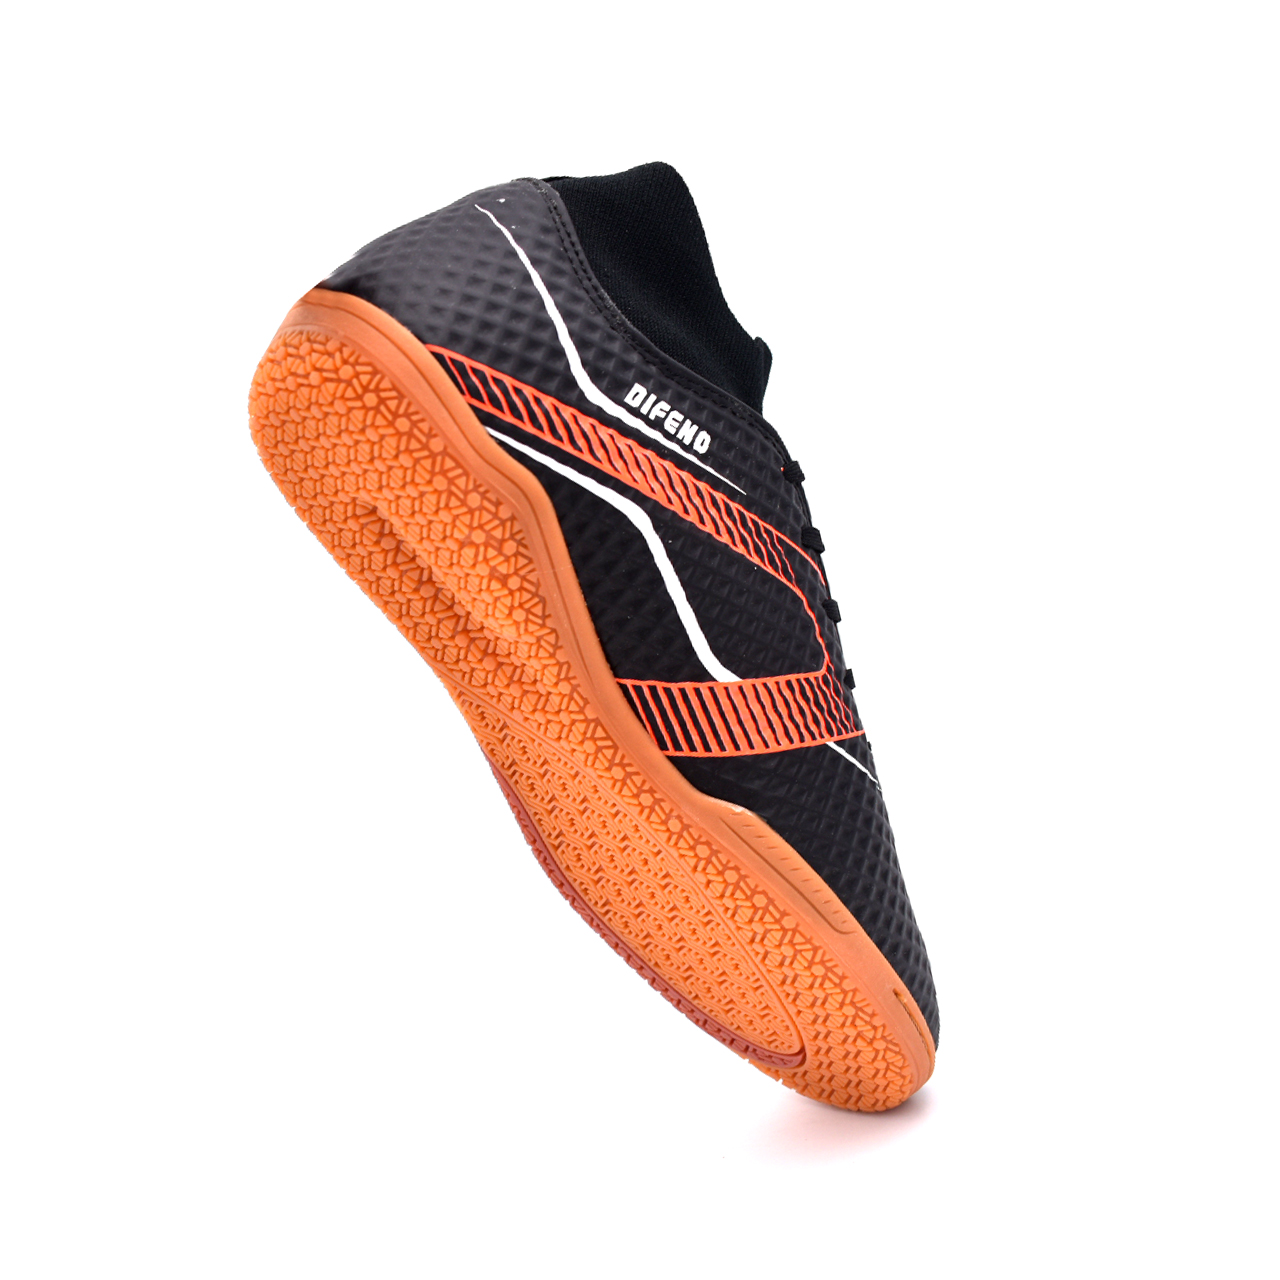 کفش فوتسال مردانه دیفانو کد c-2226